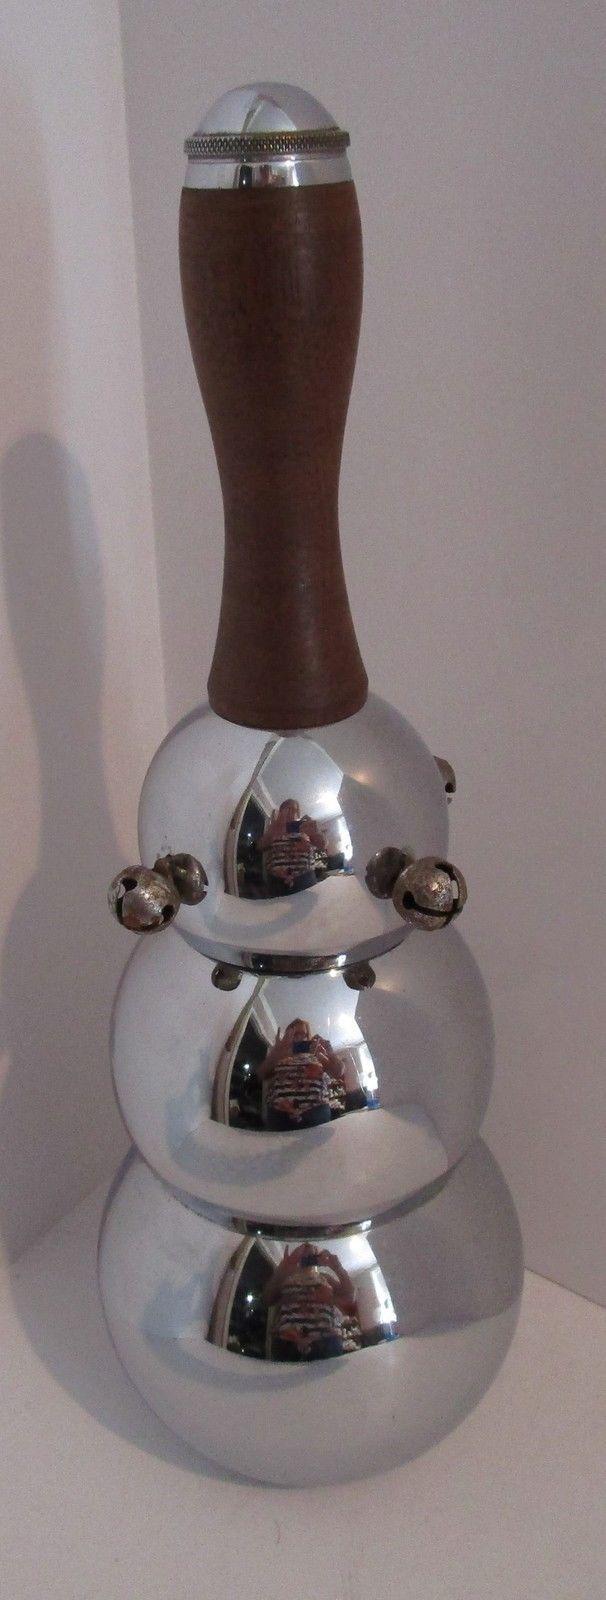 Bubble jingle bell. Mid 20th c.